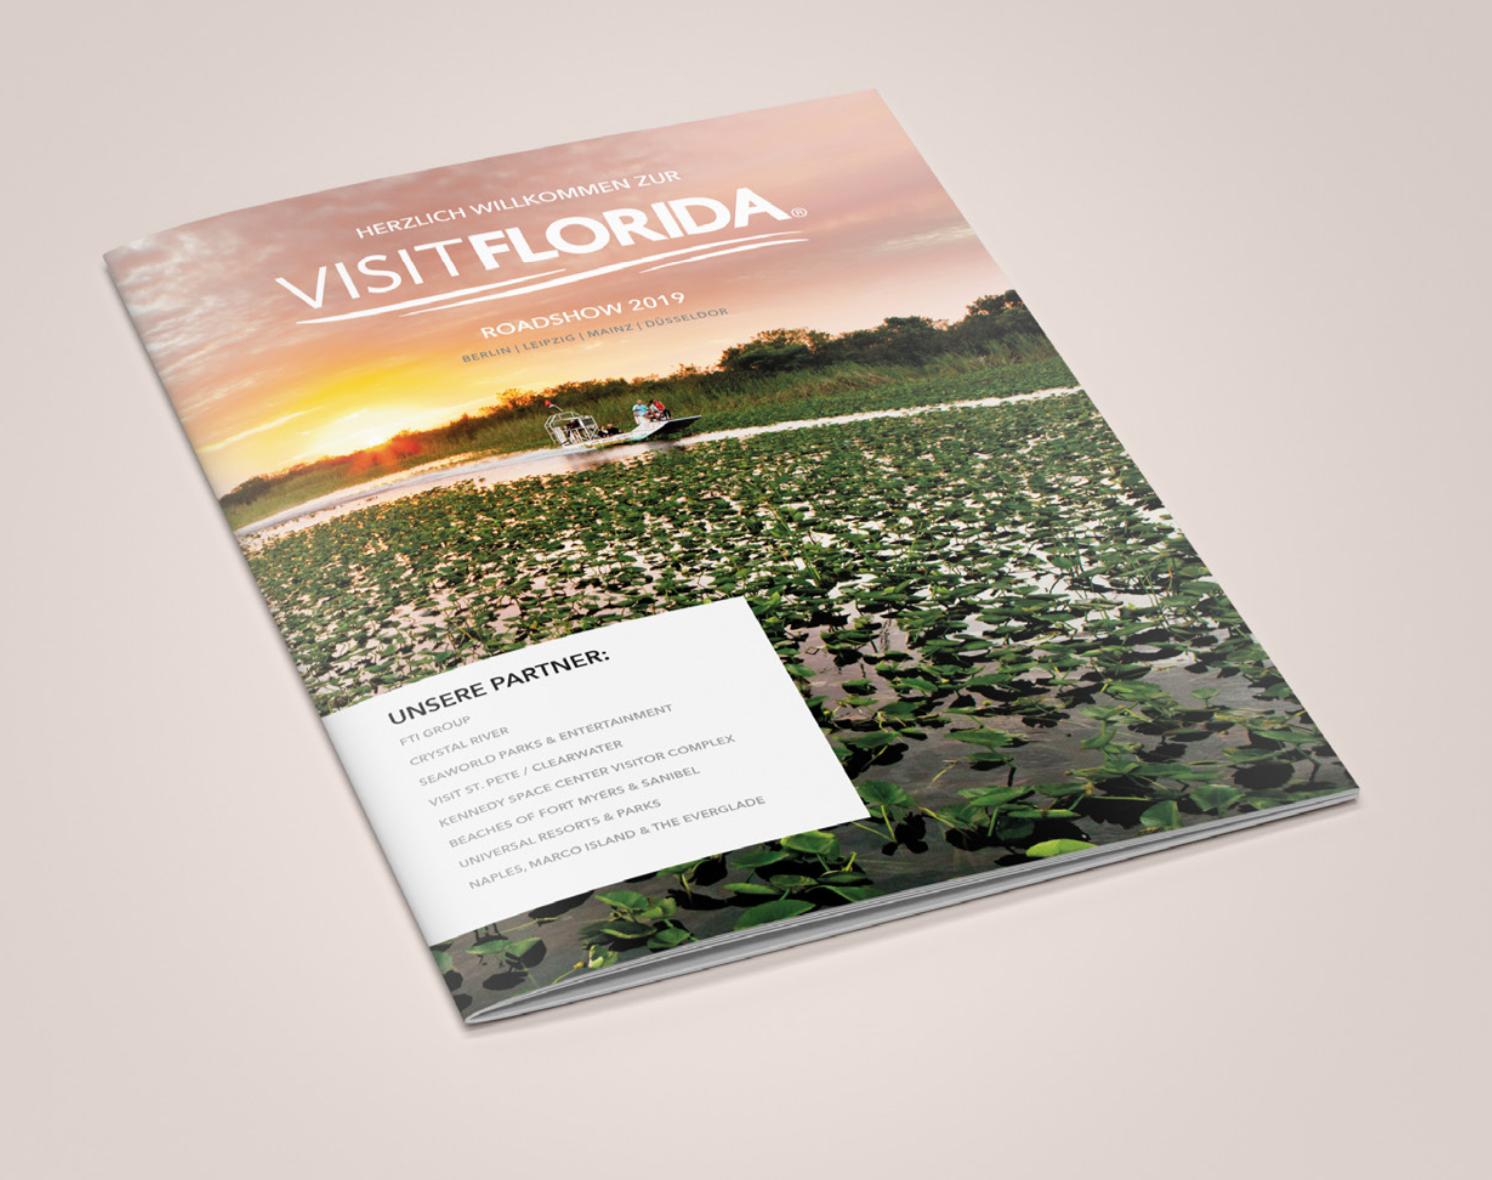 Visit Florida Broschüre